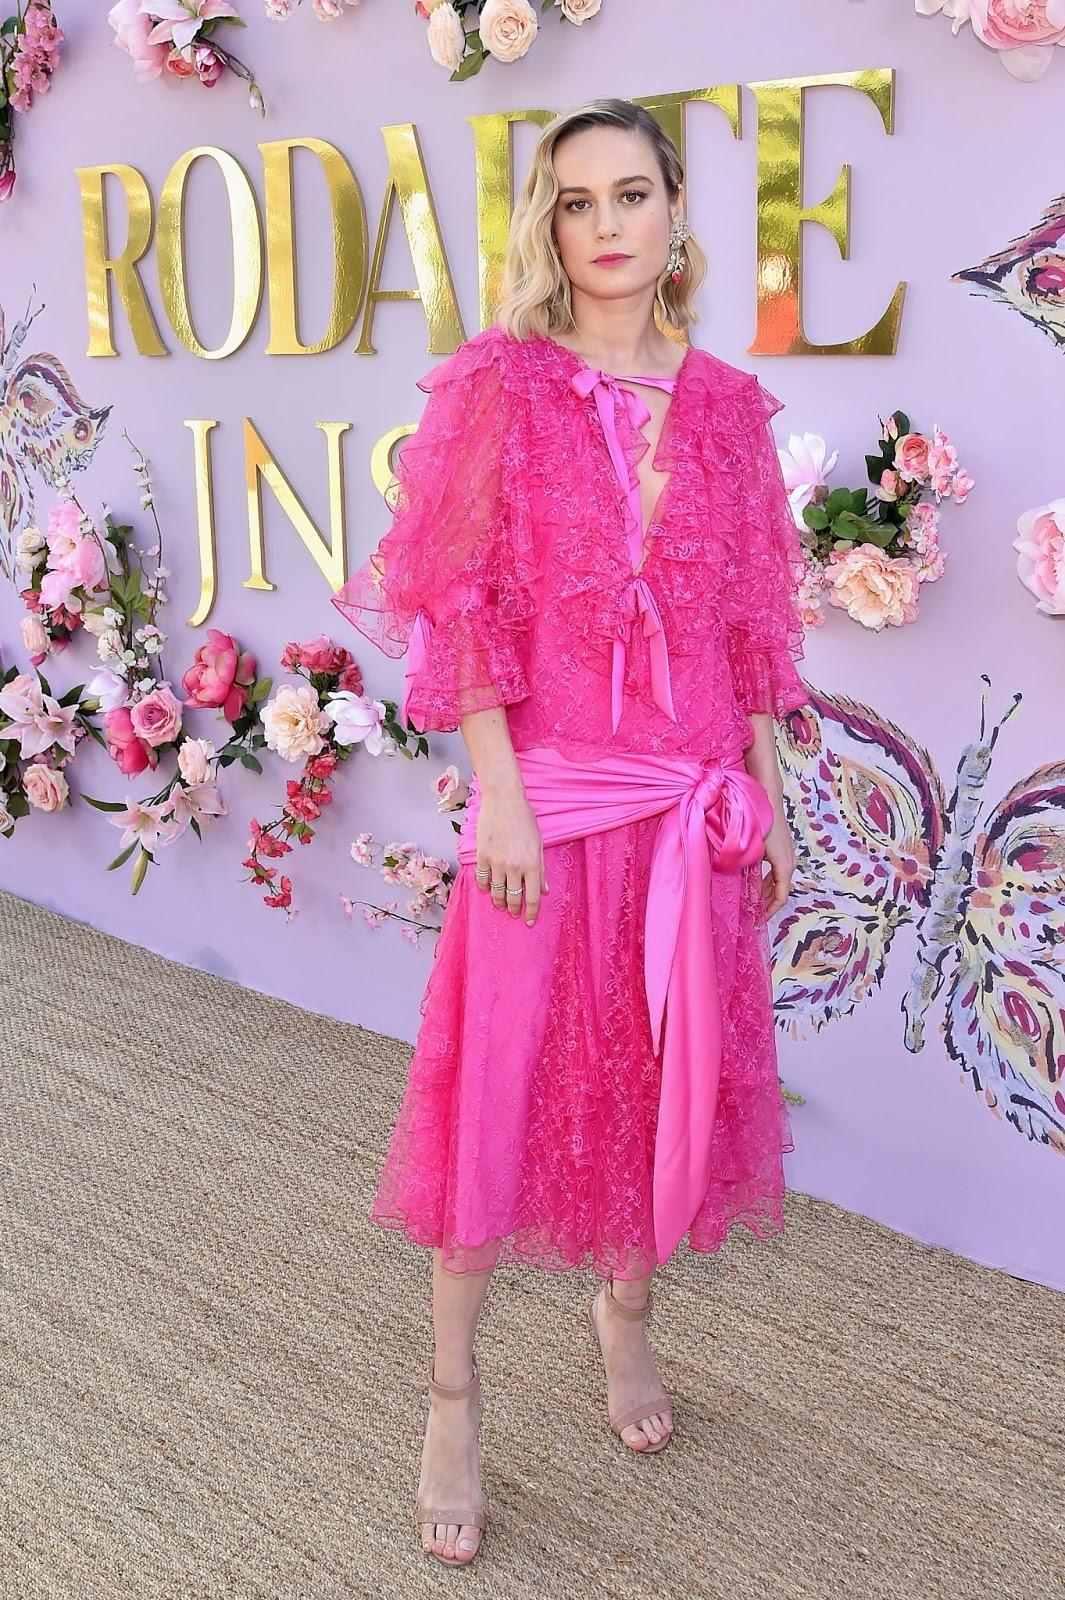 Brie Larson - Rodarte FW/19 Runway Show at the Huntington Library in San Marino - 02/05/2019